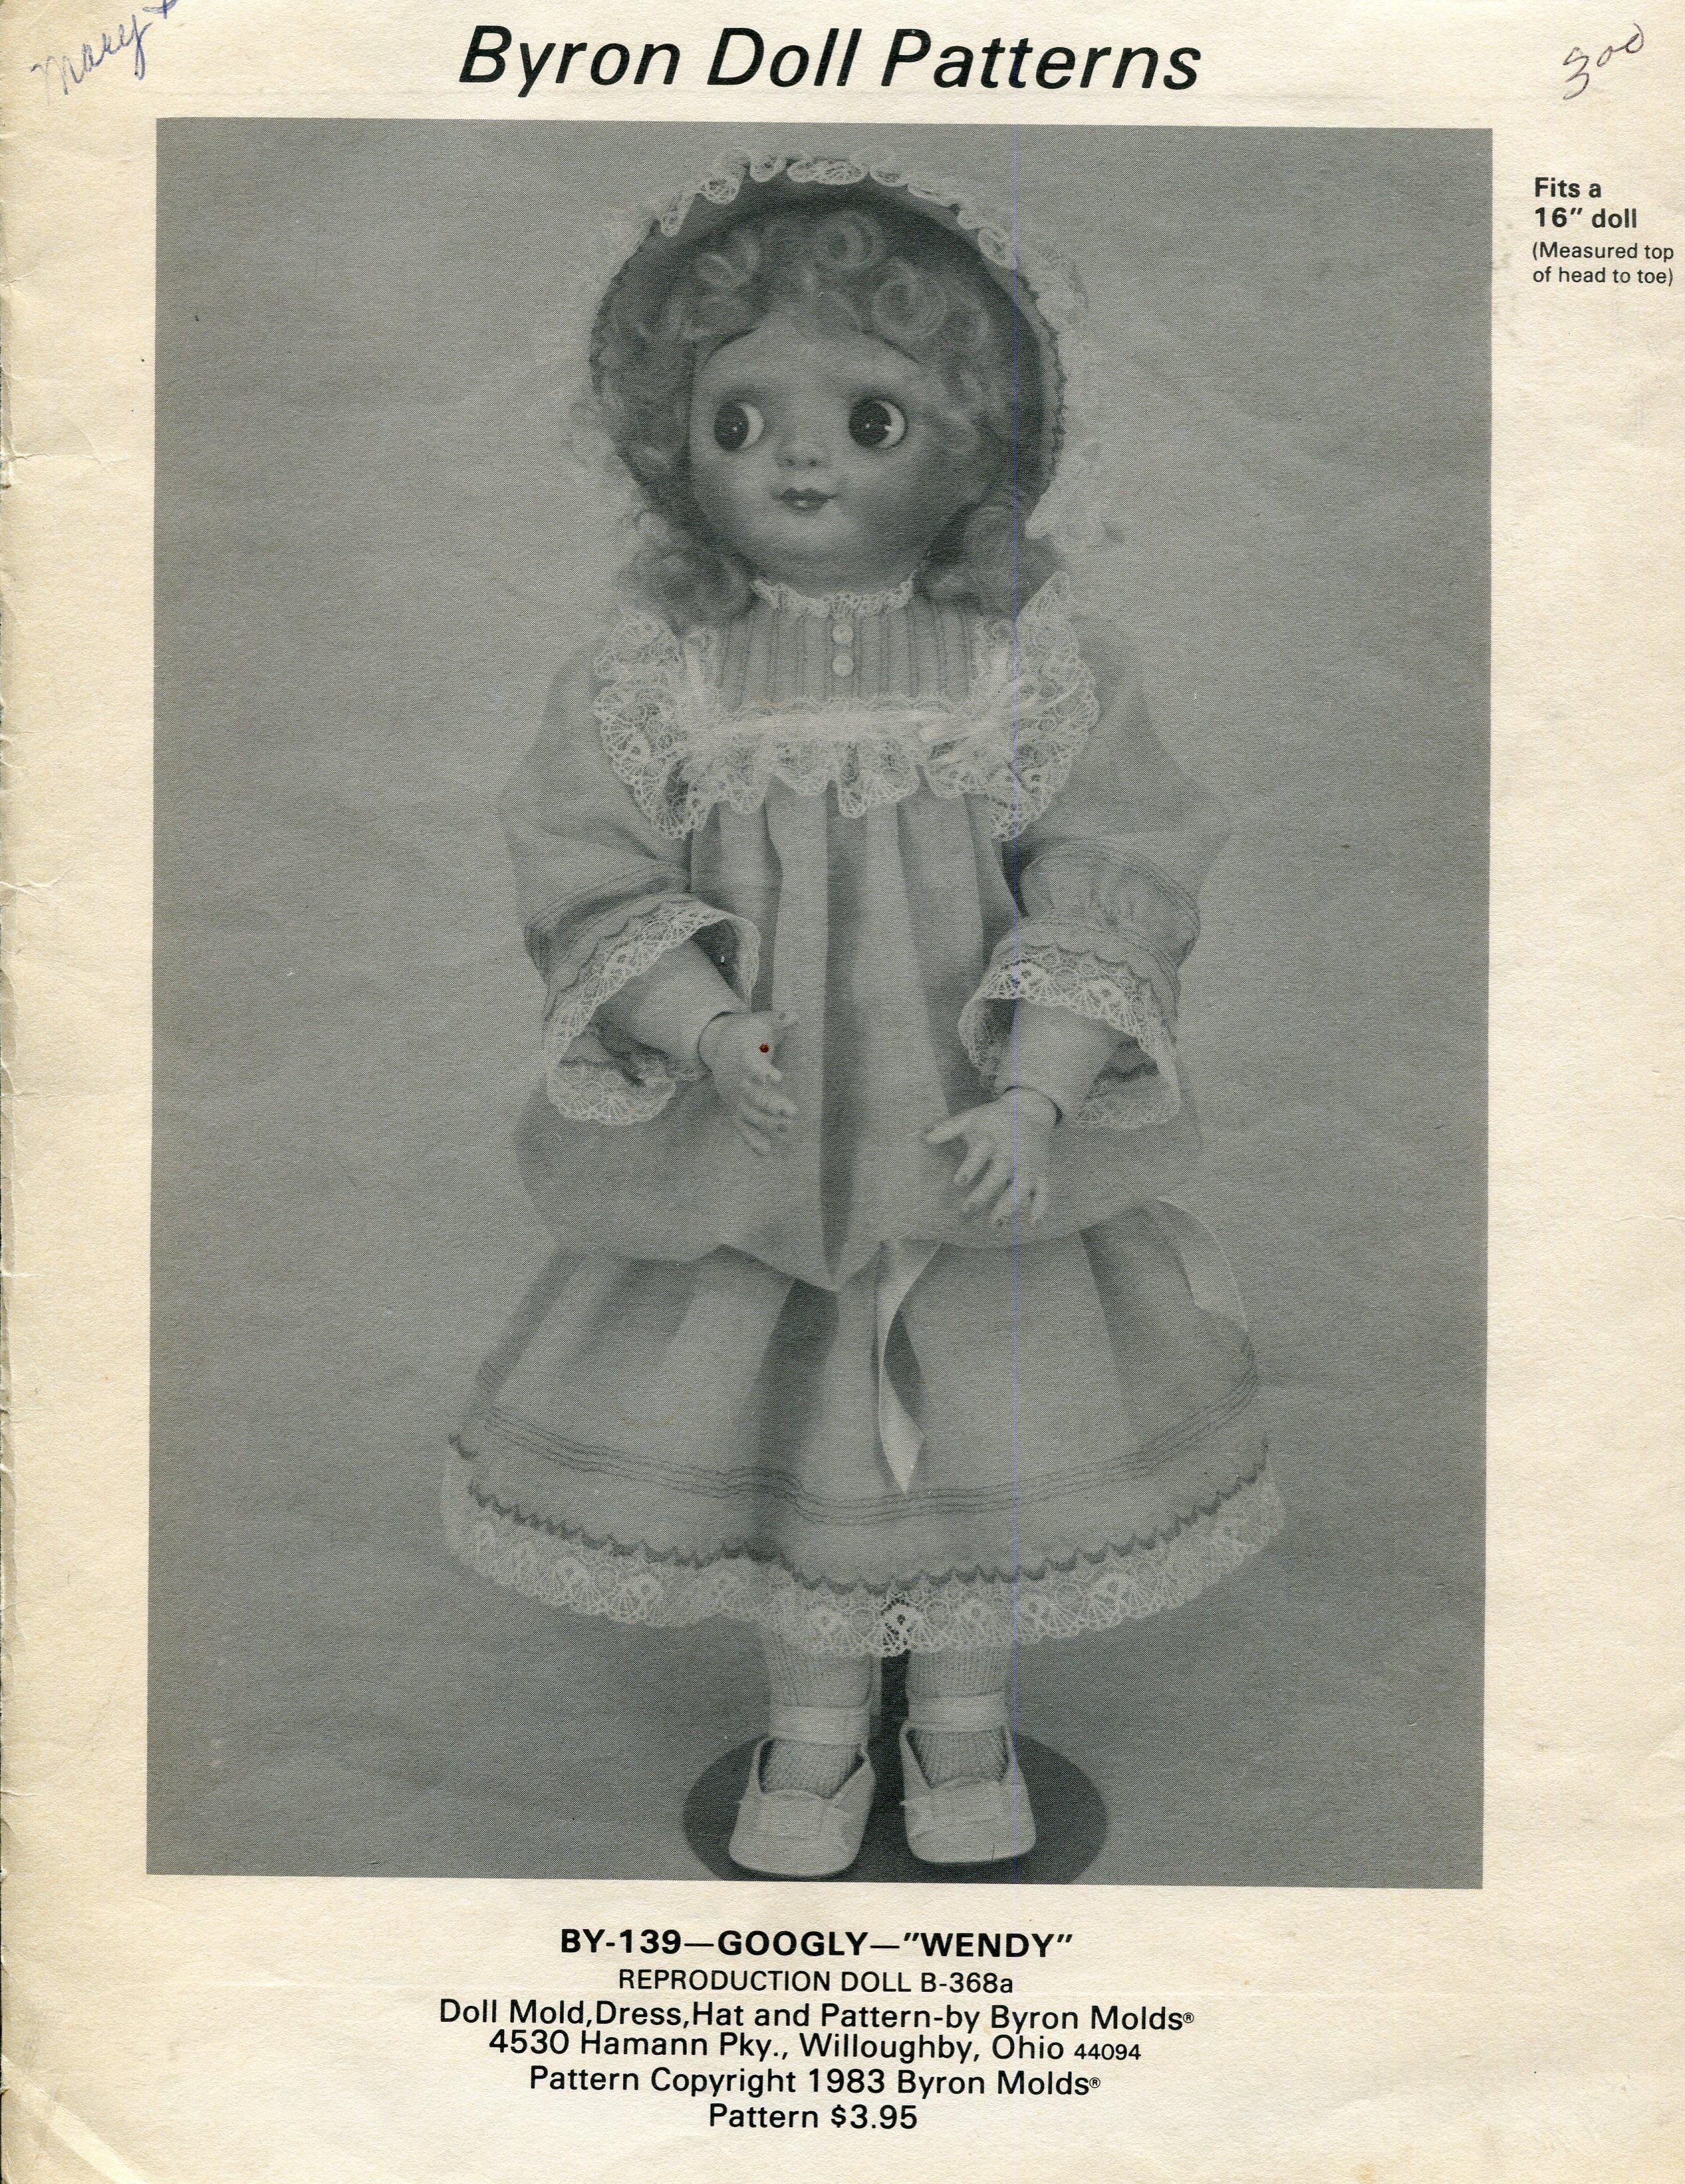 Byron Doll Patterns BY-139